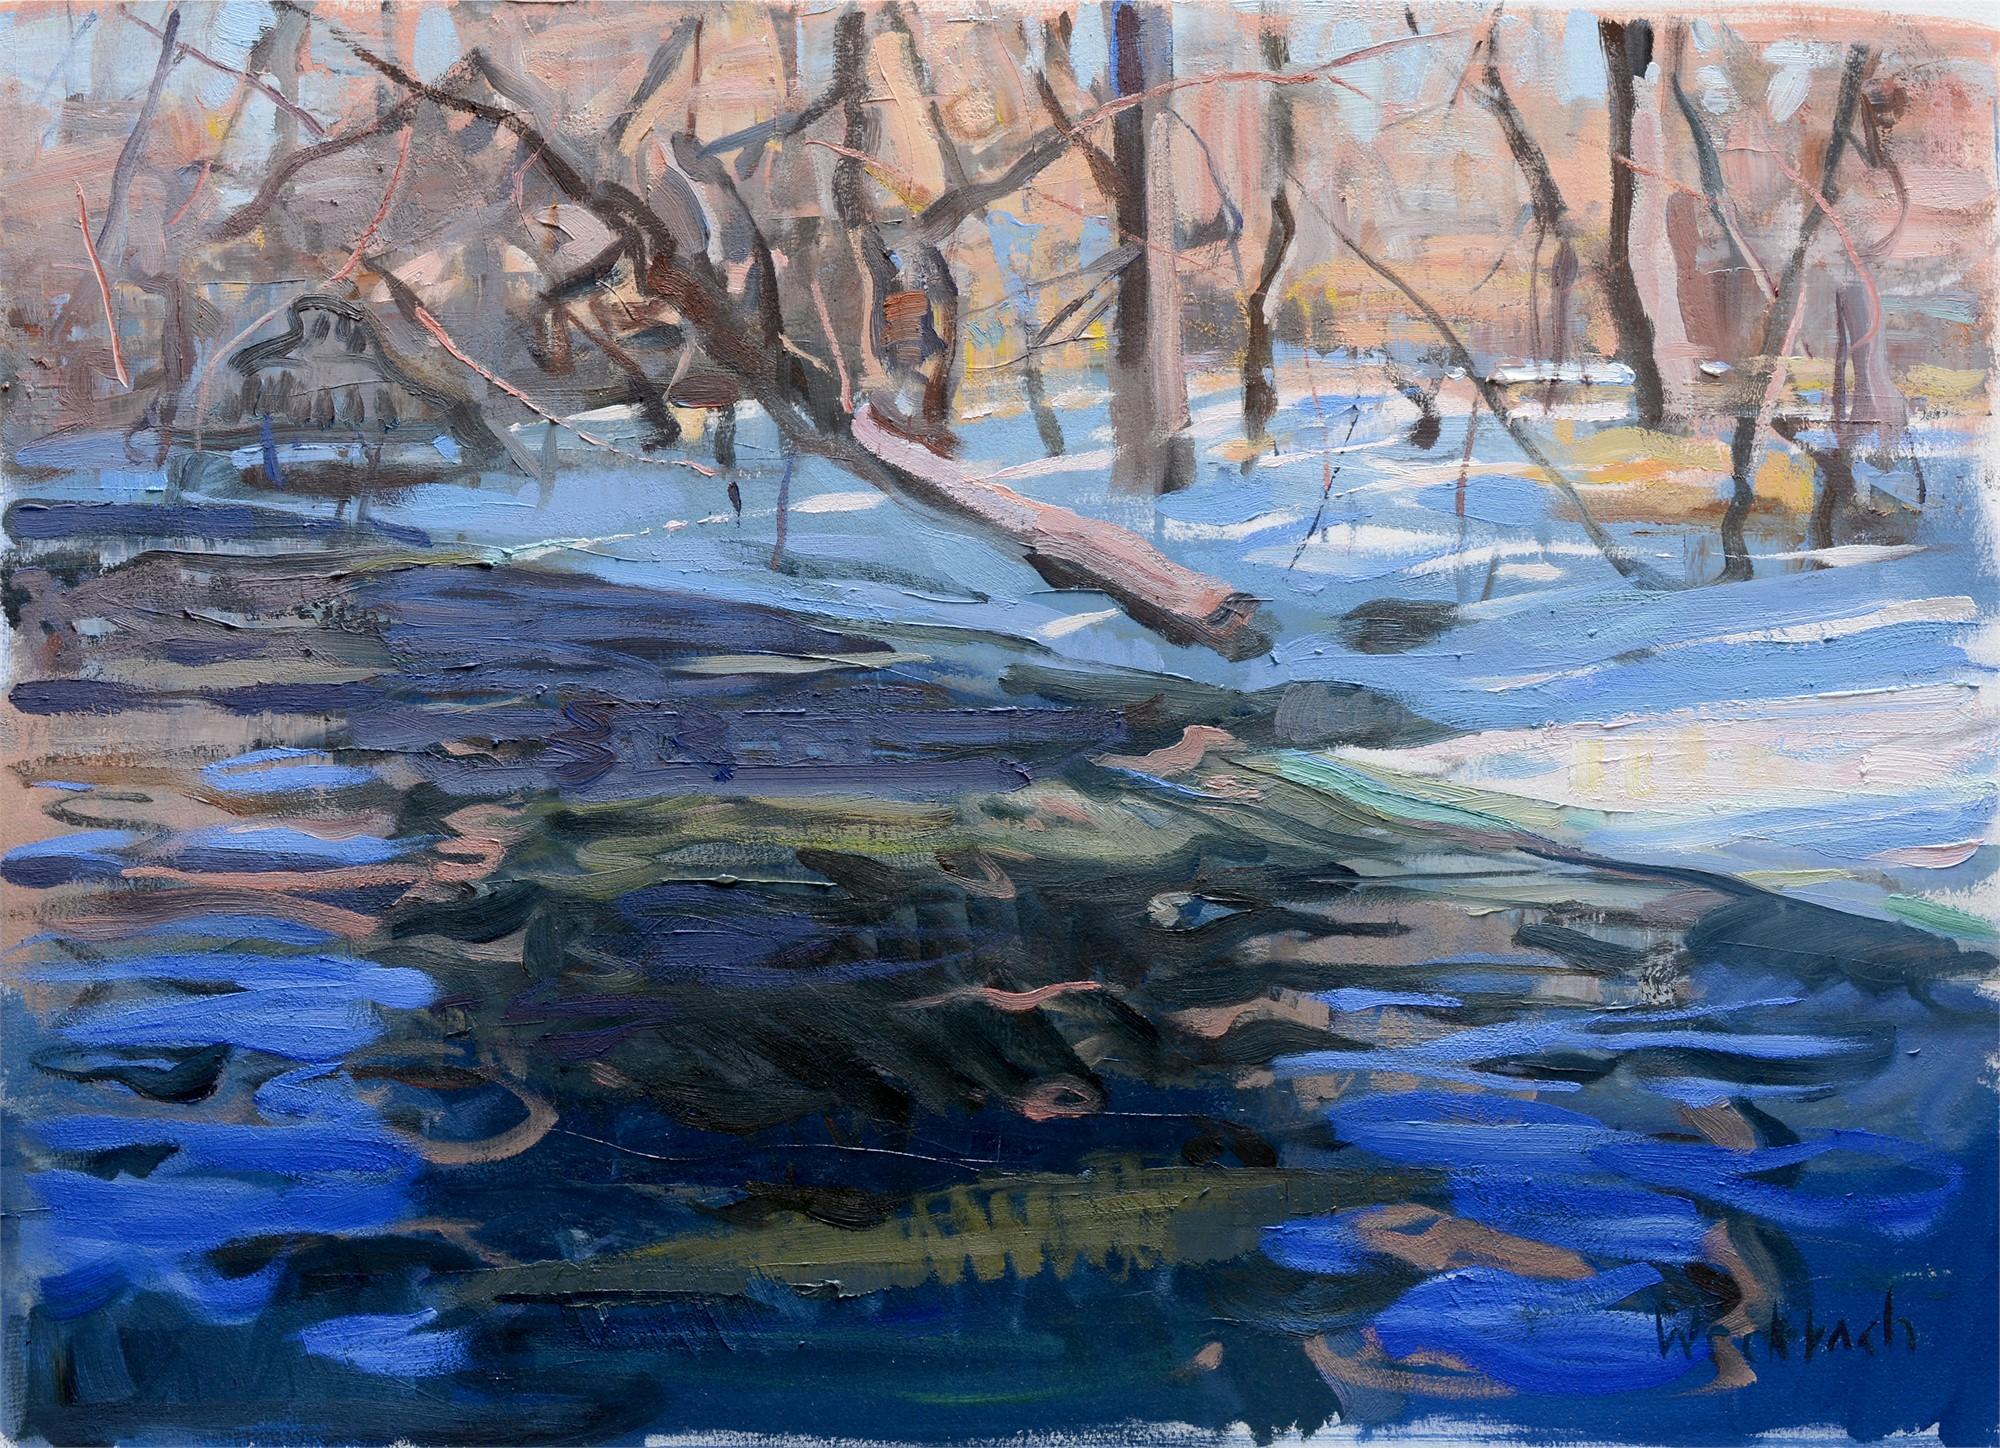 Slantering Tree by Kevin Weckbach